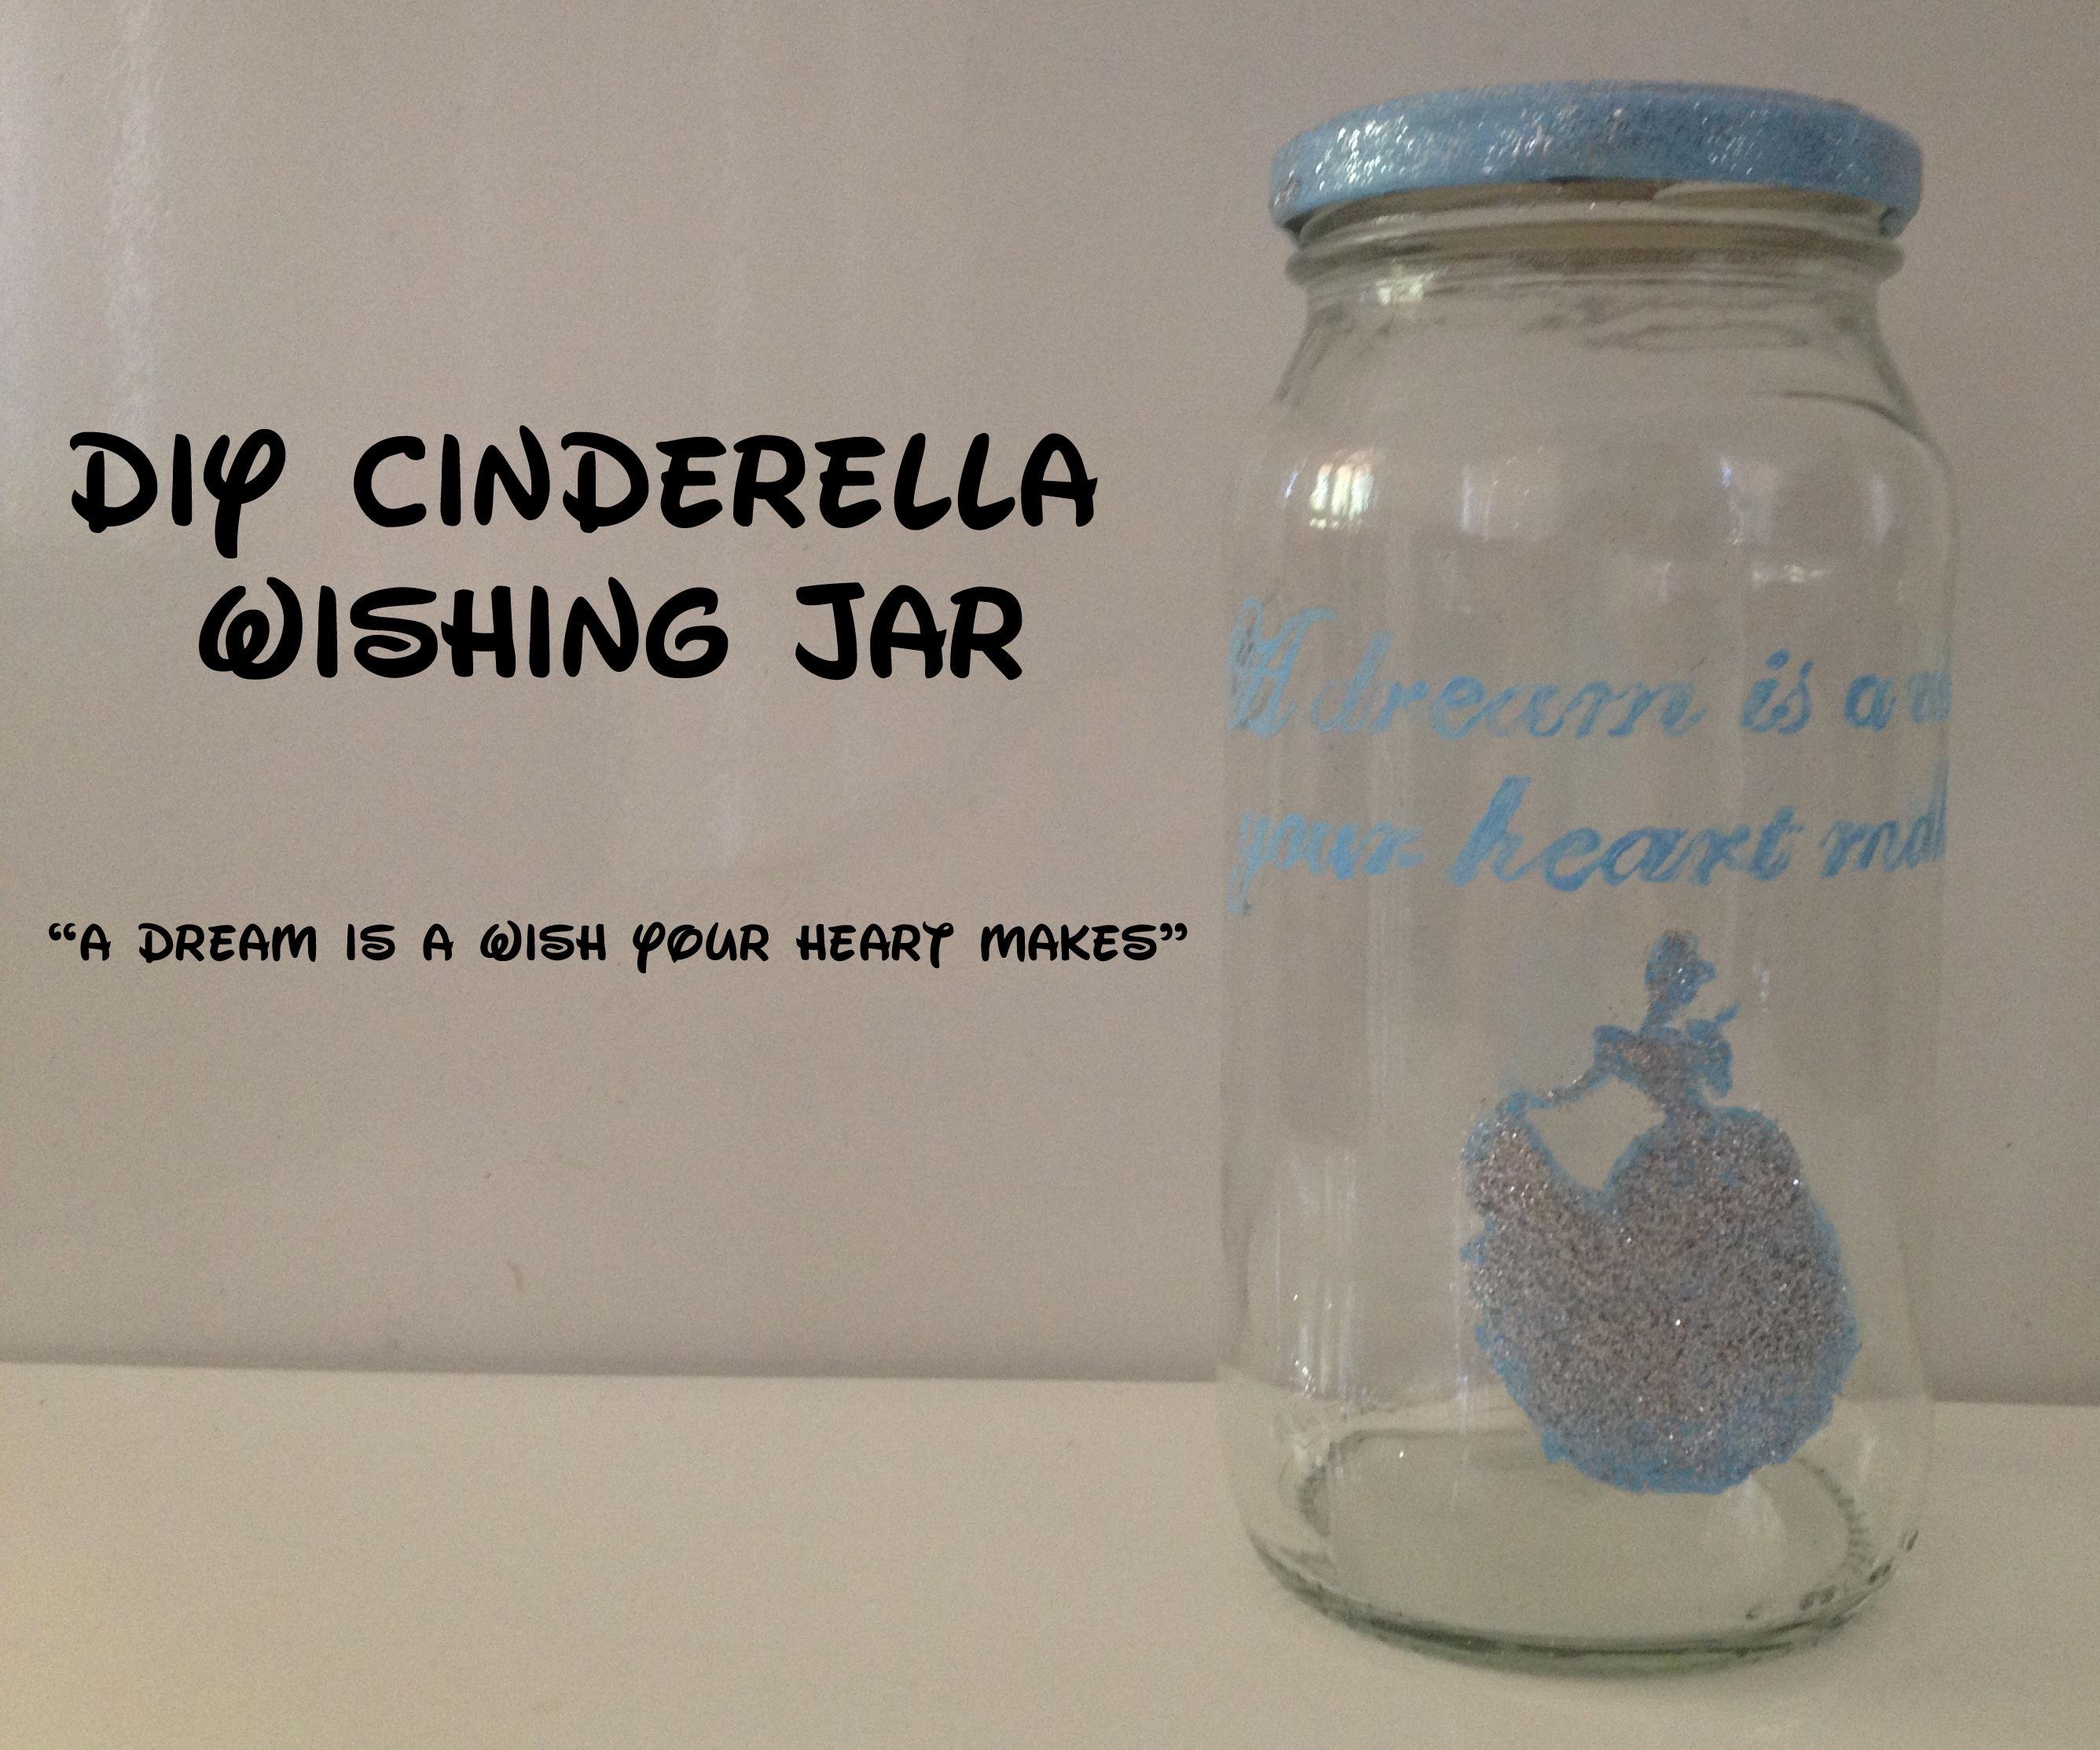 DIY Disney's Cinderella Wishing Jar